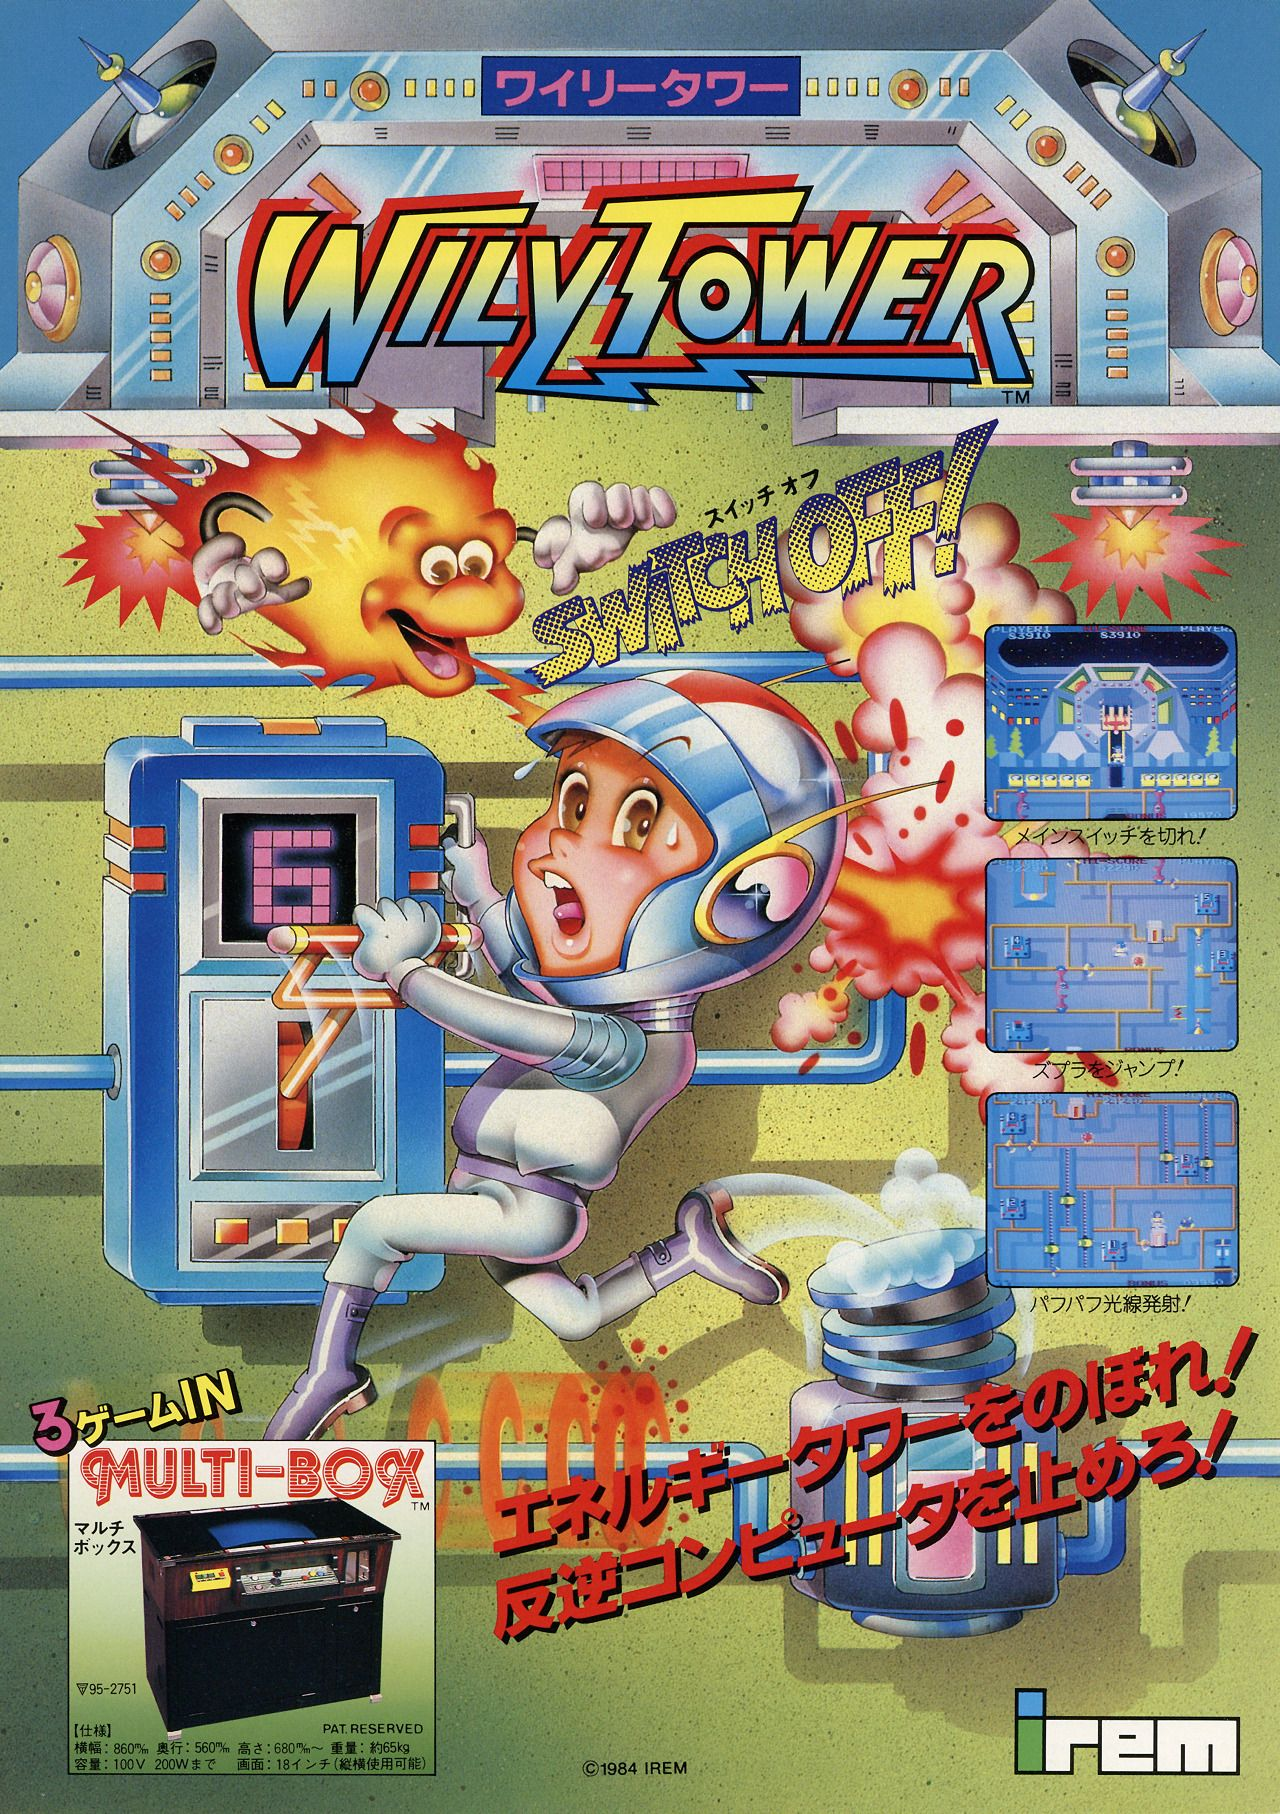 Flyerfever Wily Tower Irem Arcade 1984 Arcade Video Games Arcade Game Machines Retro Gaming Art